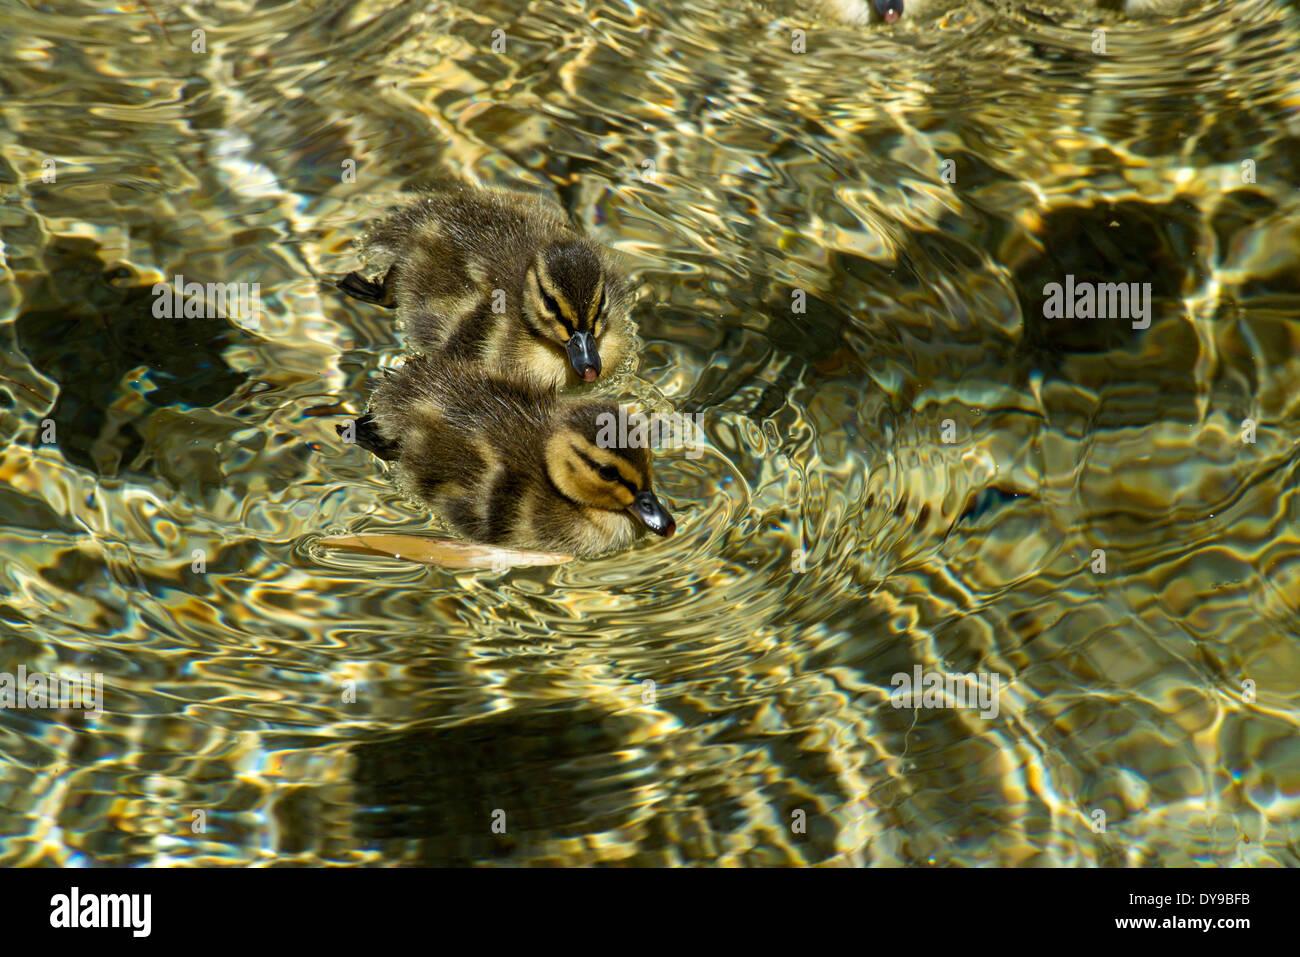 mallard ducklings, duck, animals, birds, USA, United States, America, water - Stock Image